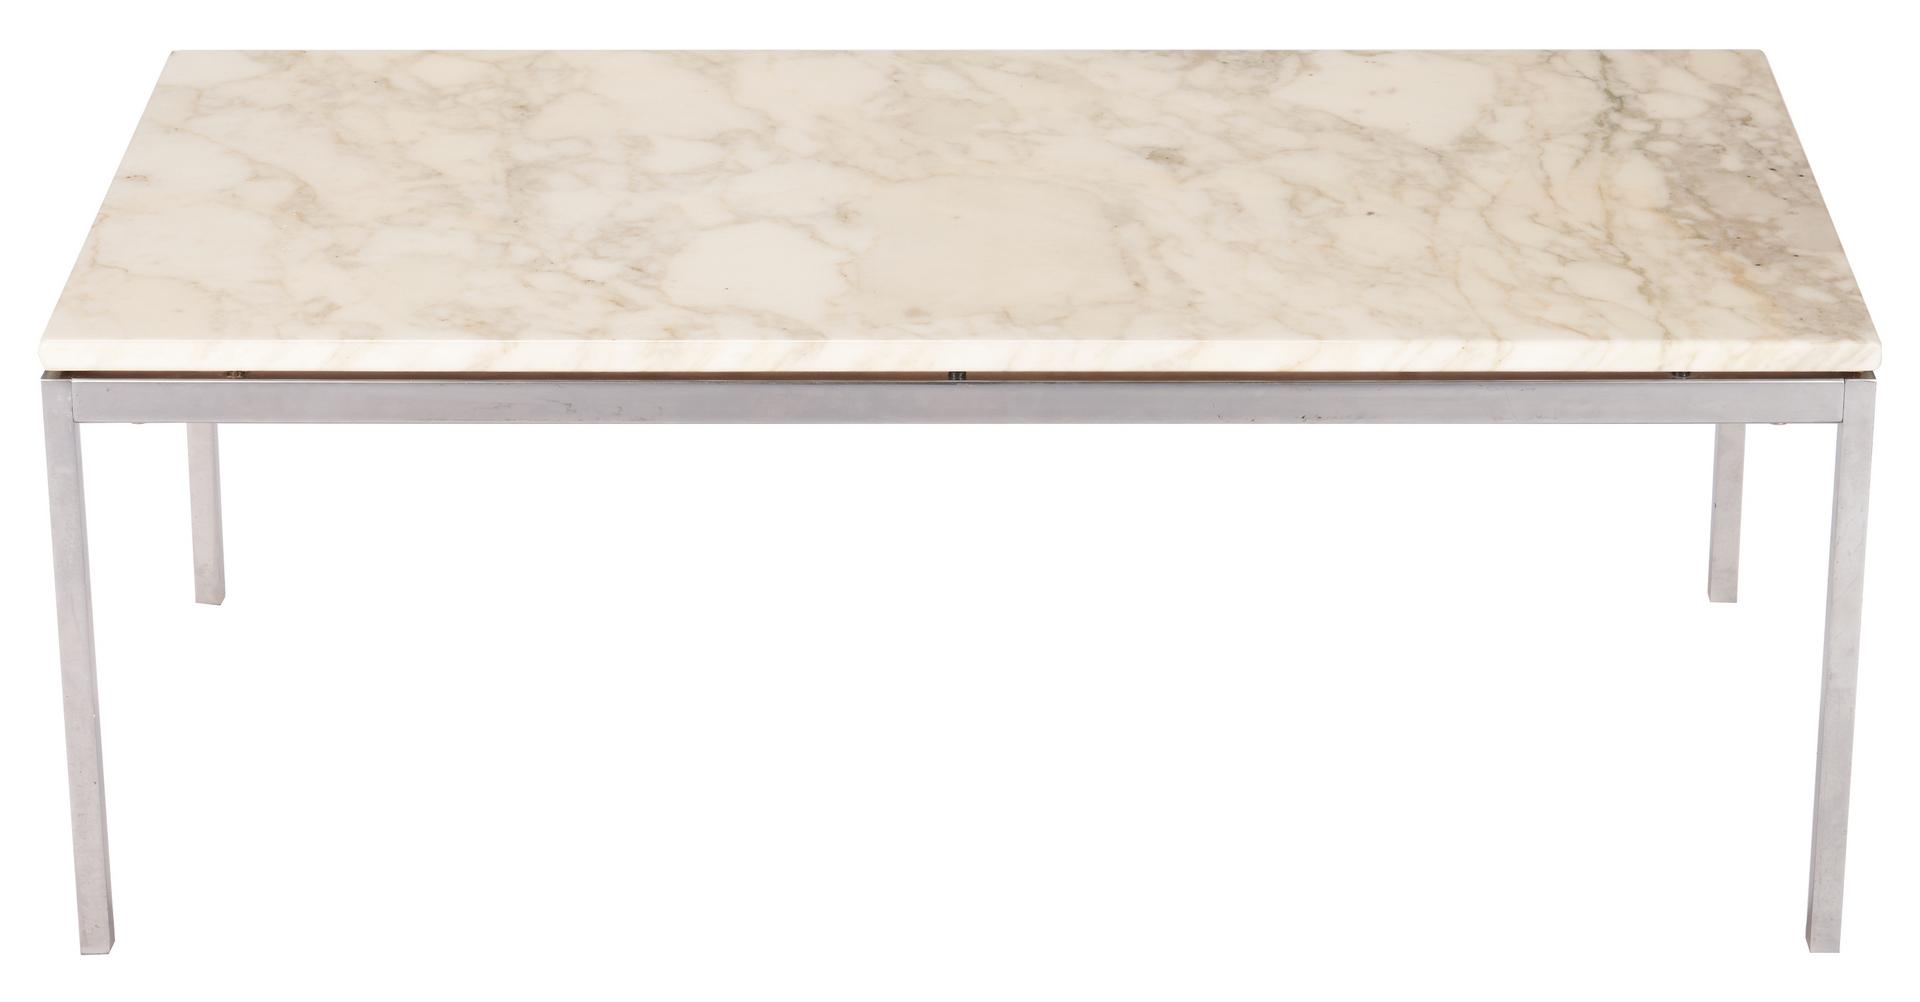 Lot 598: Mid-Century Florence Knoll Rectangular Coffee Table